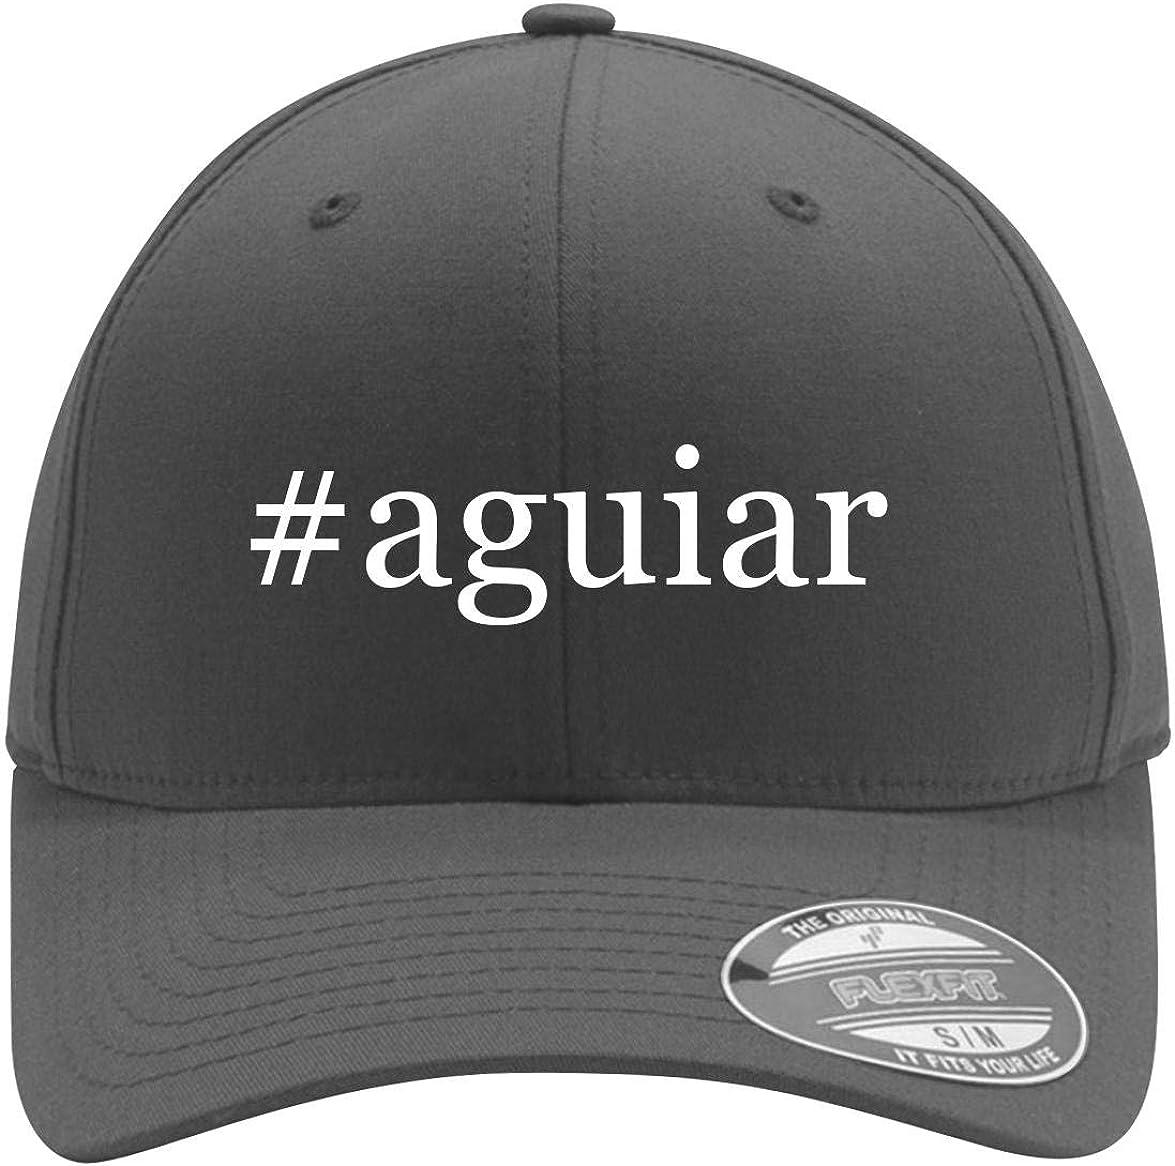 #Aguiar - Adult Men'S Hashtag Flexfit Baseball Hut Cap